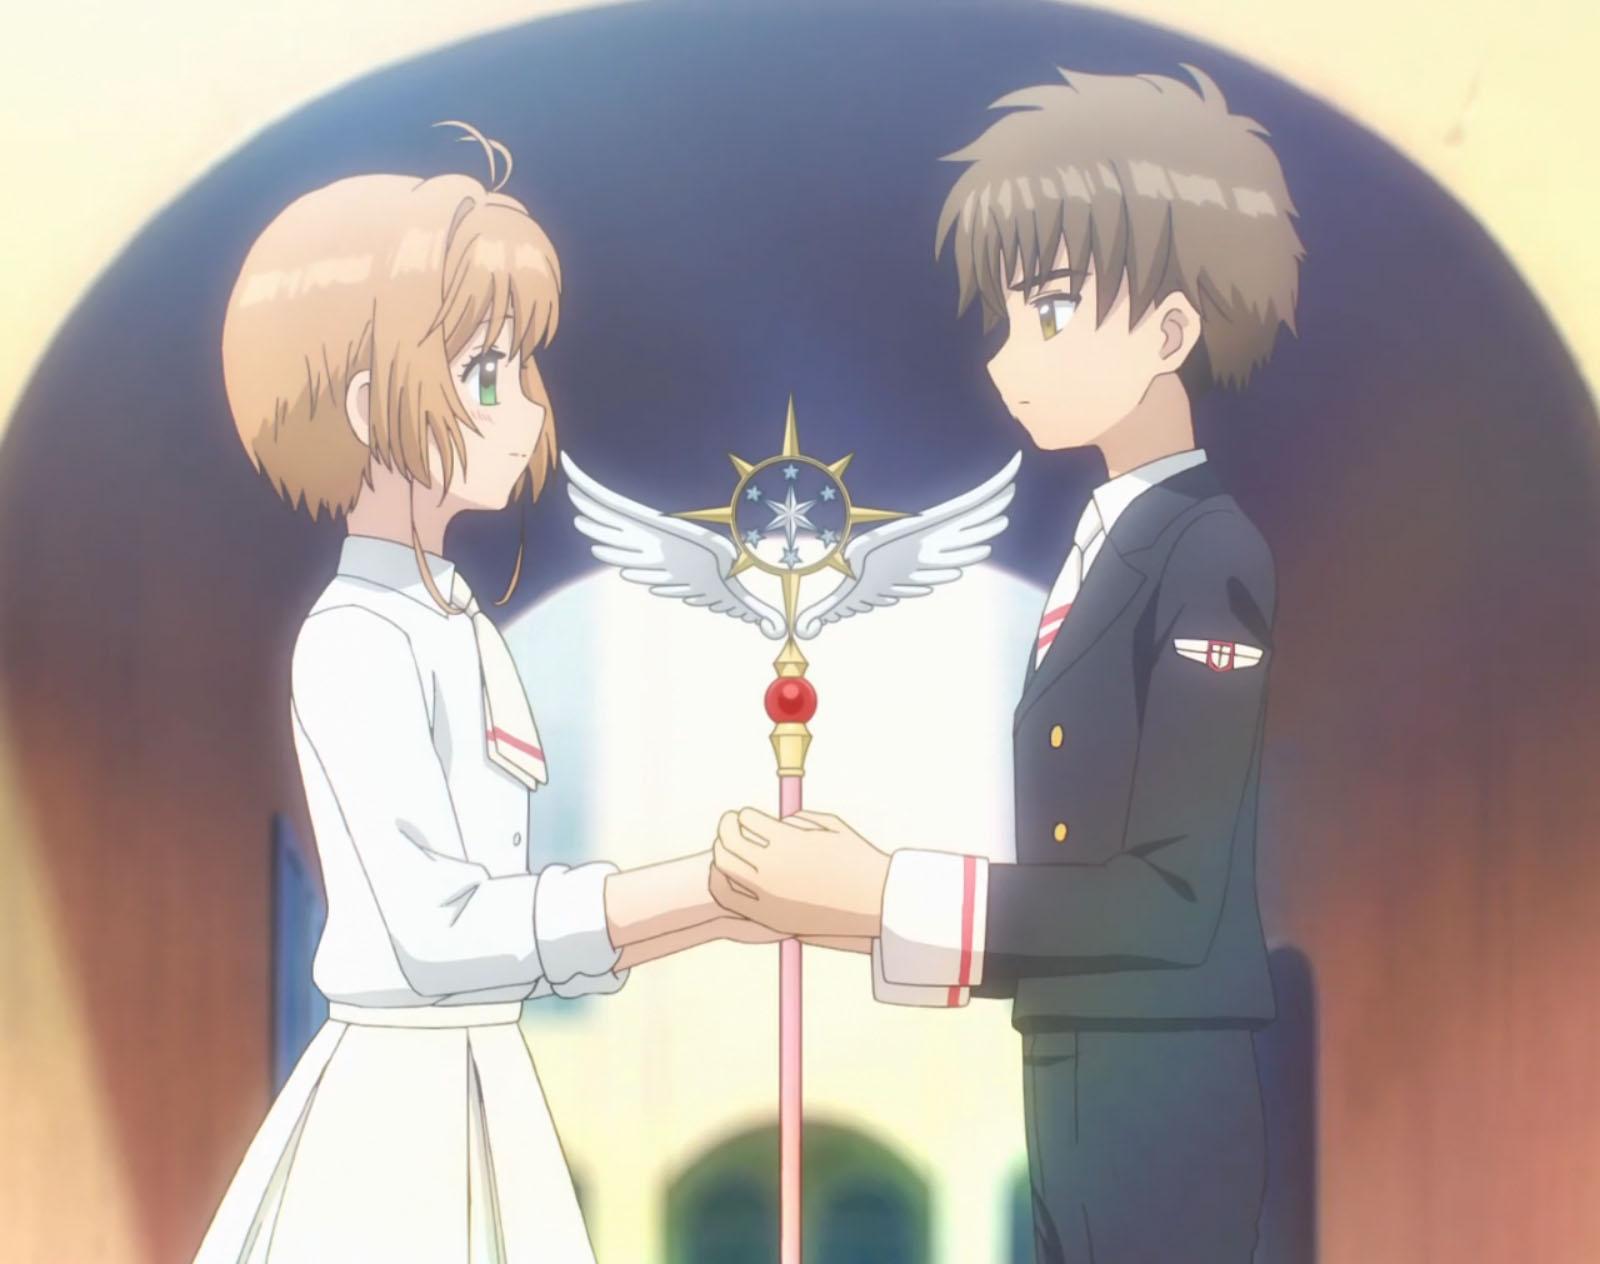 Holding her wand, from Cardcaptor Sakura.